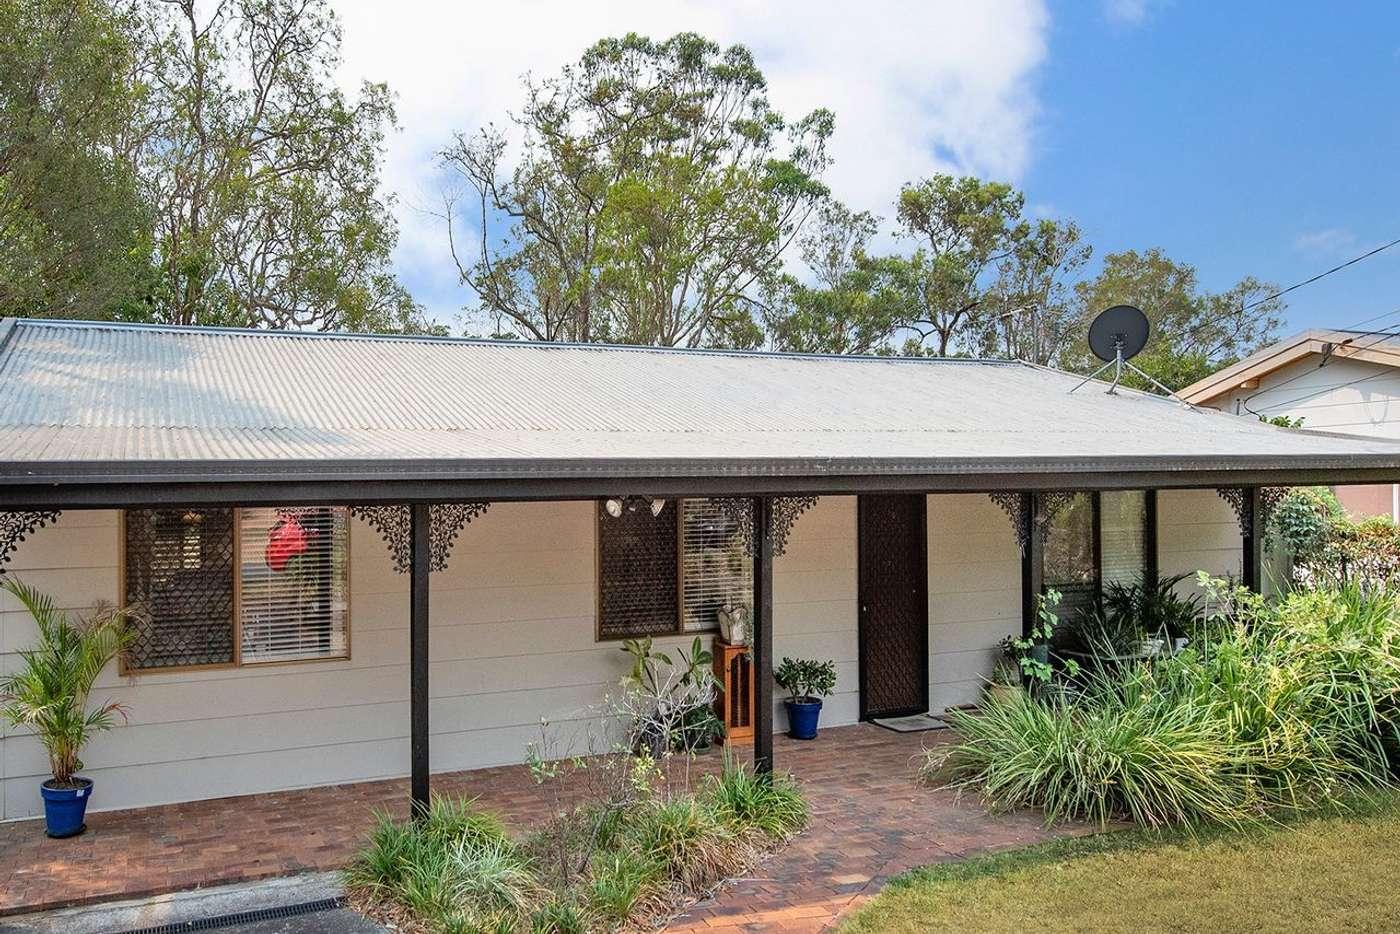 Main view of Homely house listing, 10 Tonya Court, Woodridge QLD 4114